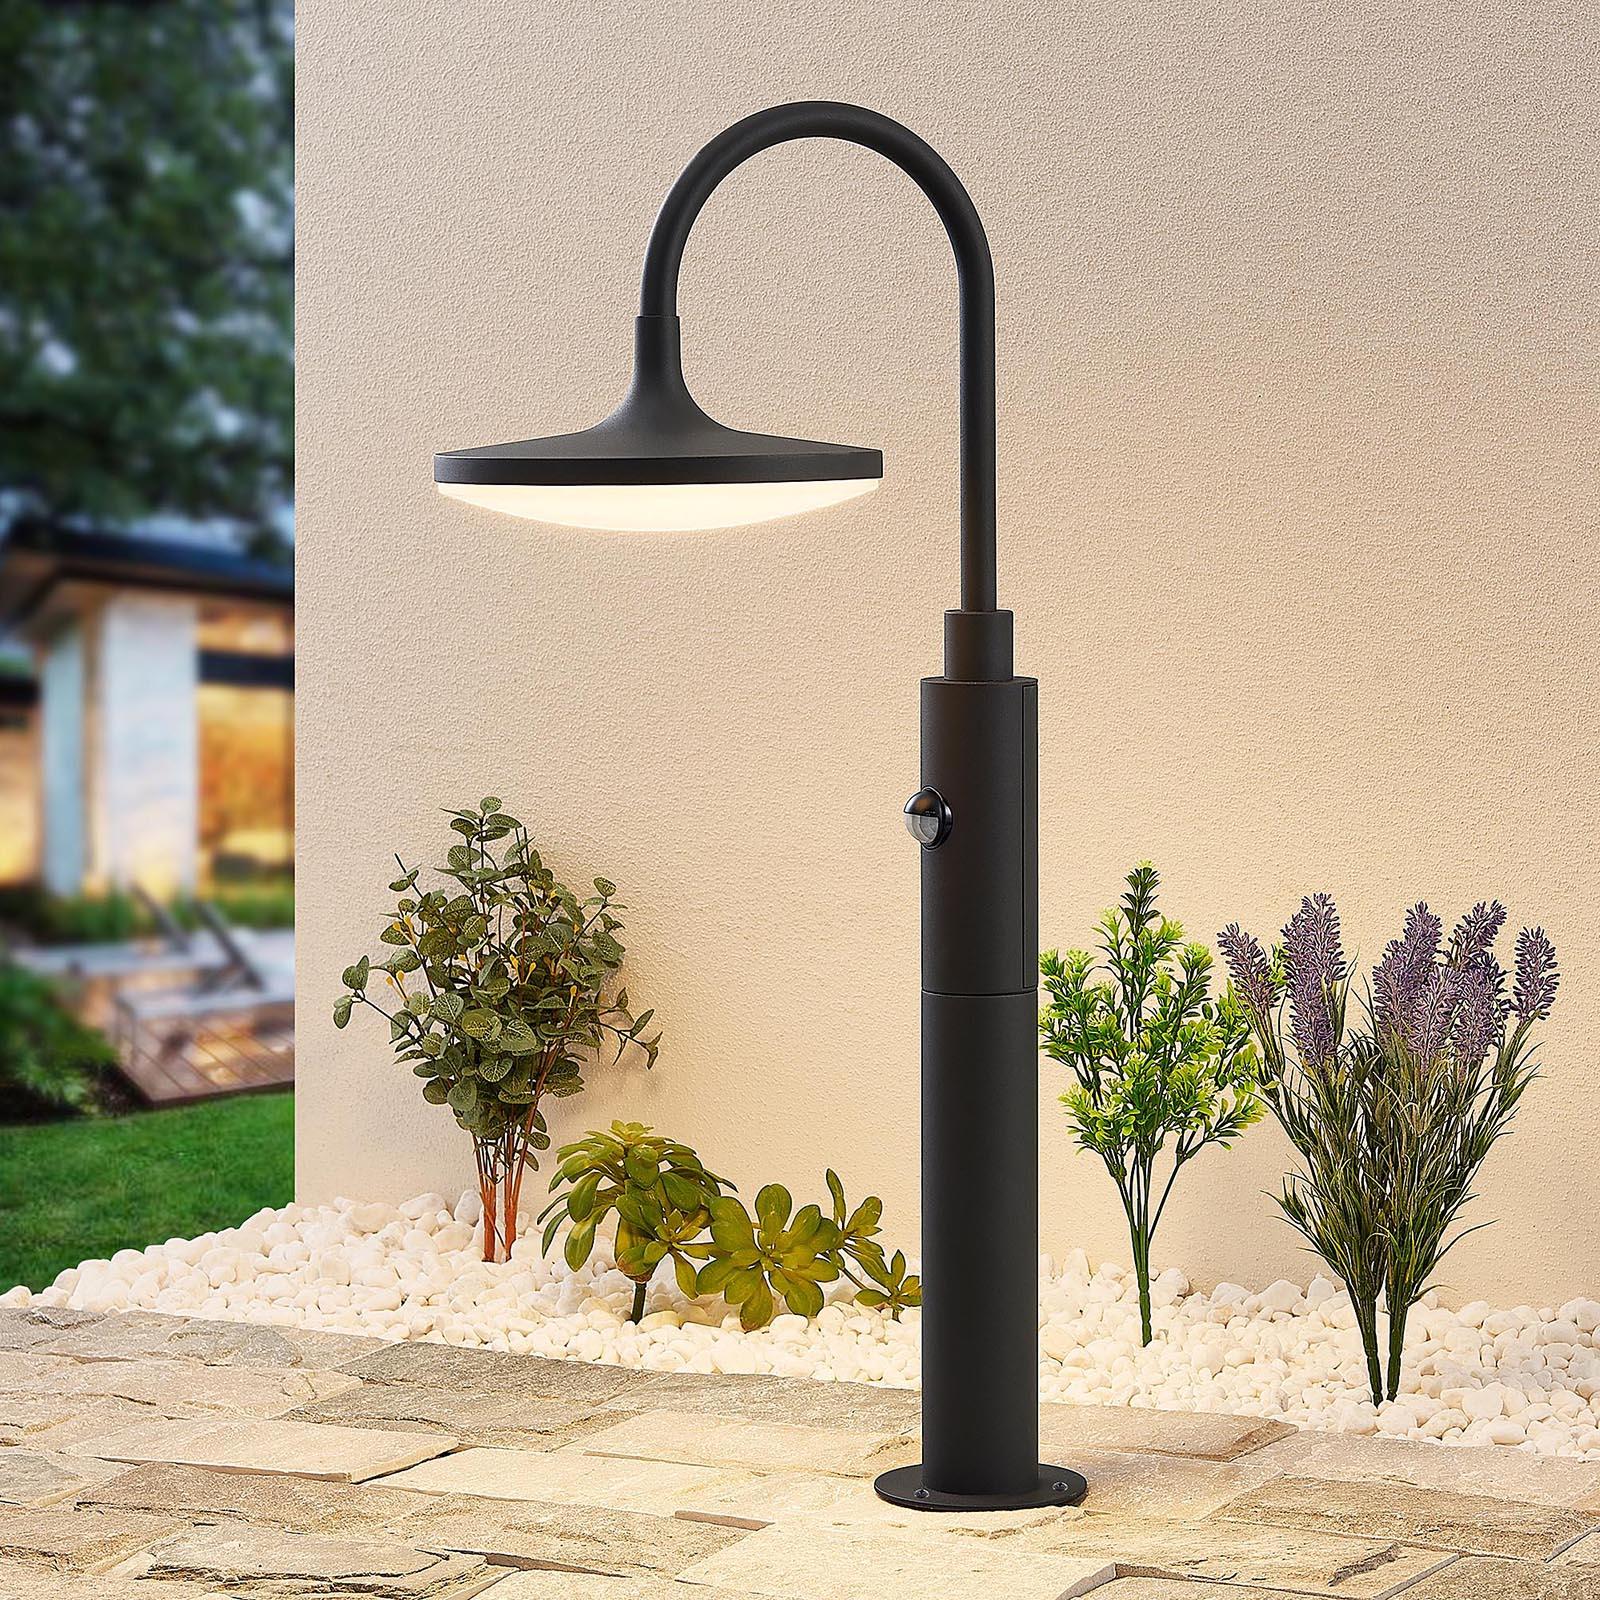 Arcchio Fineria LED-Sockelleuchte mit Sensor